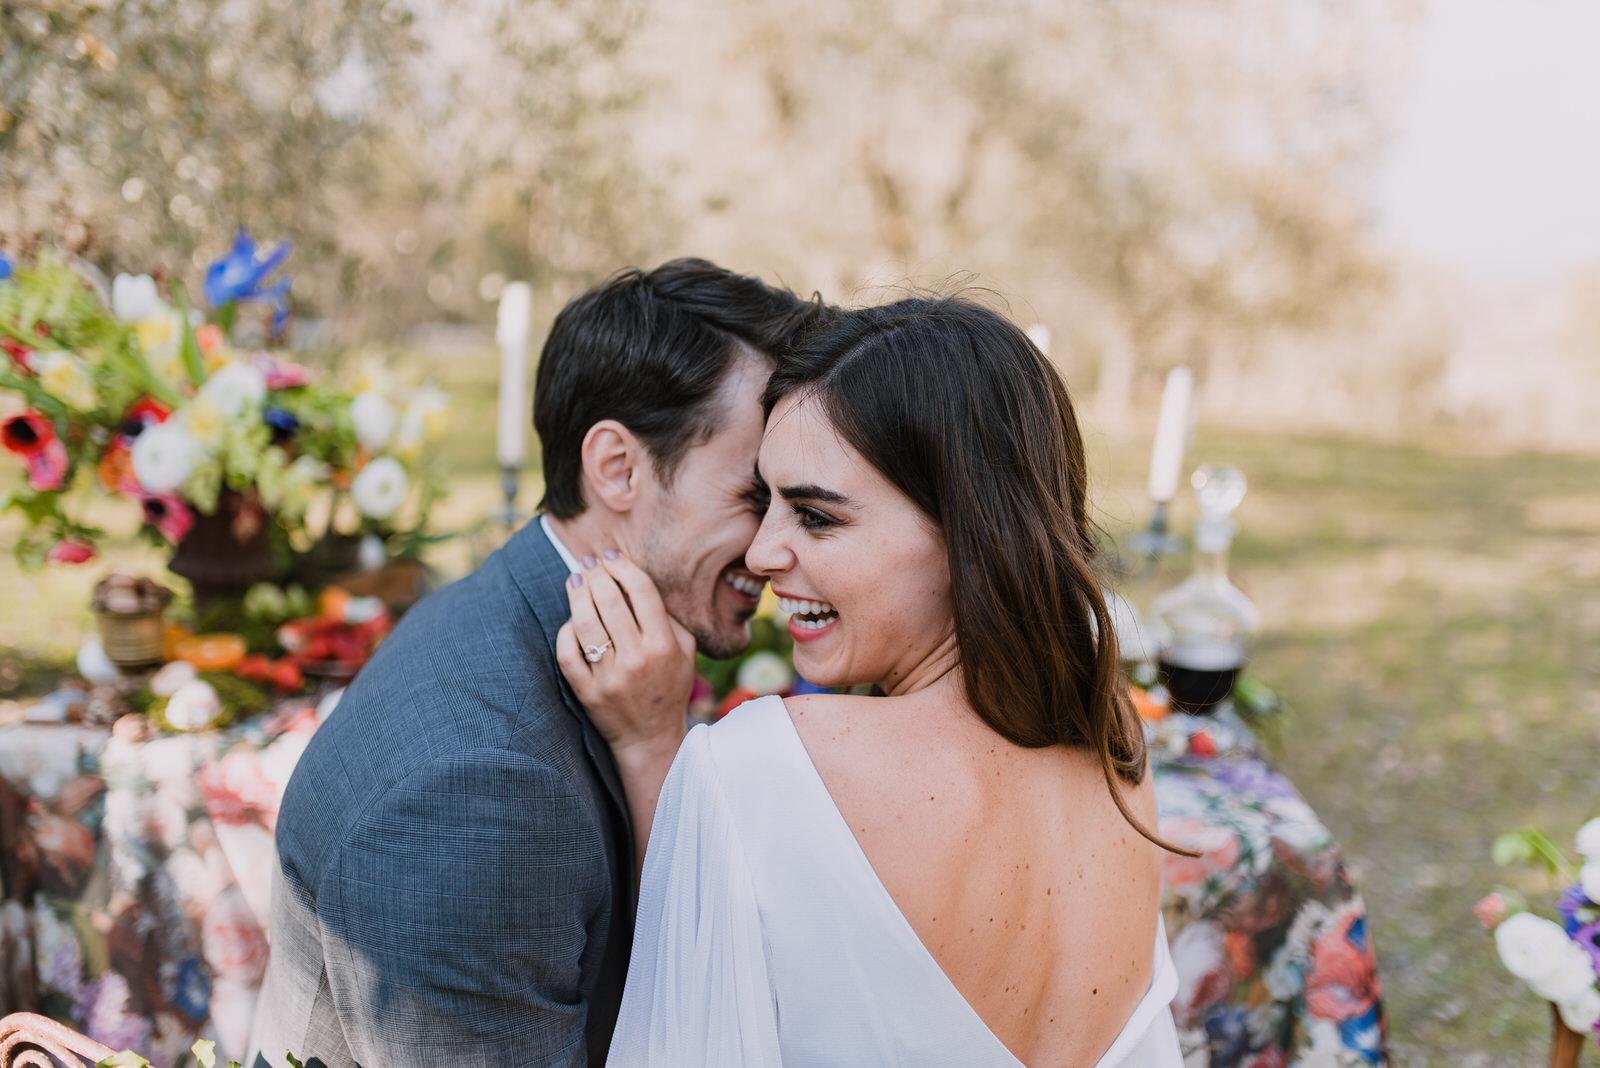 tuscany wedding photography 64.jpg